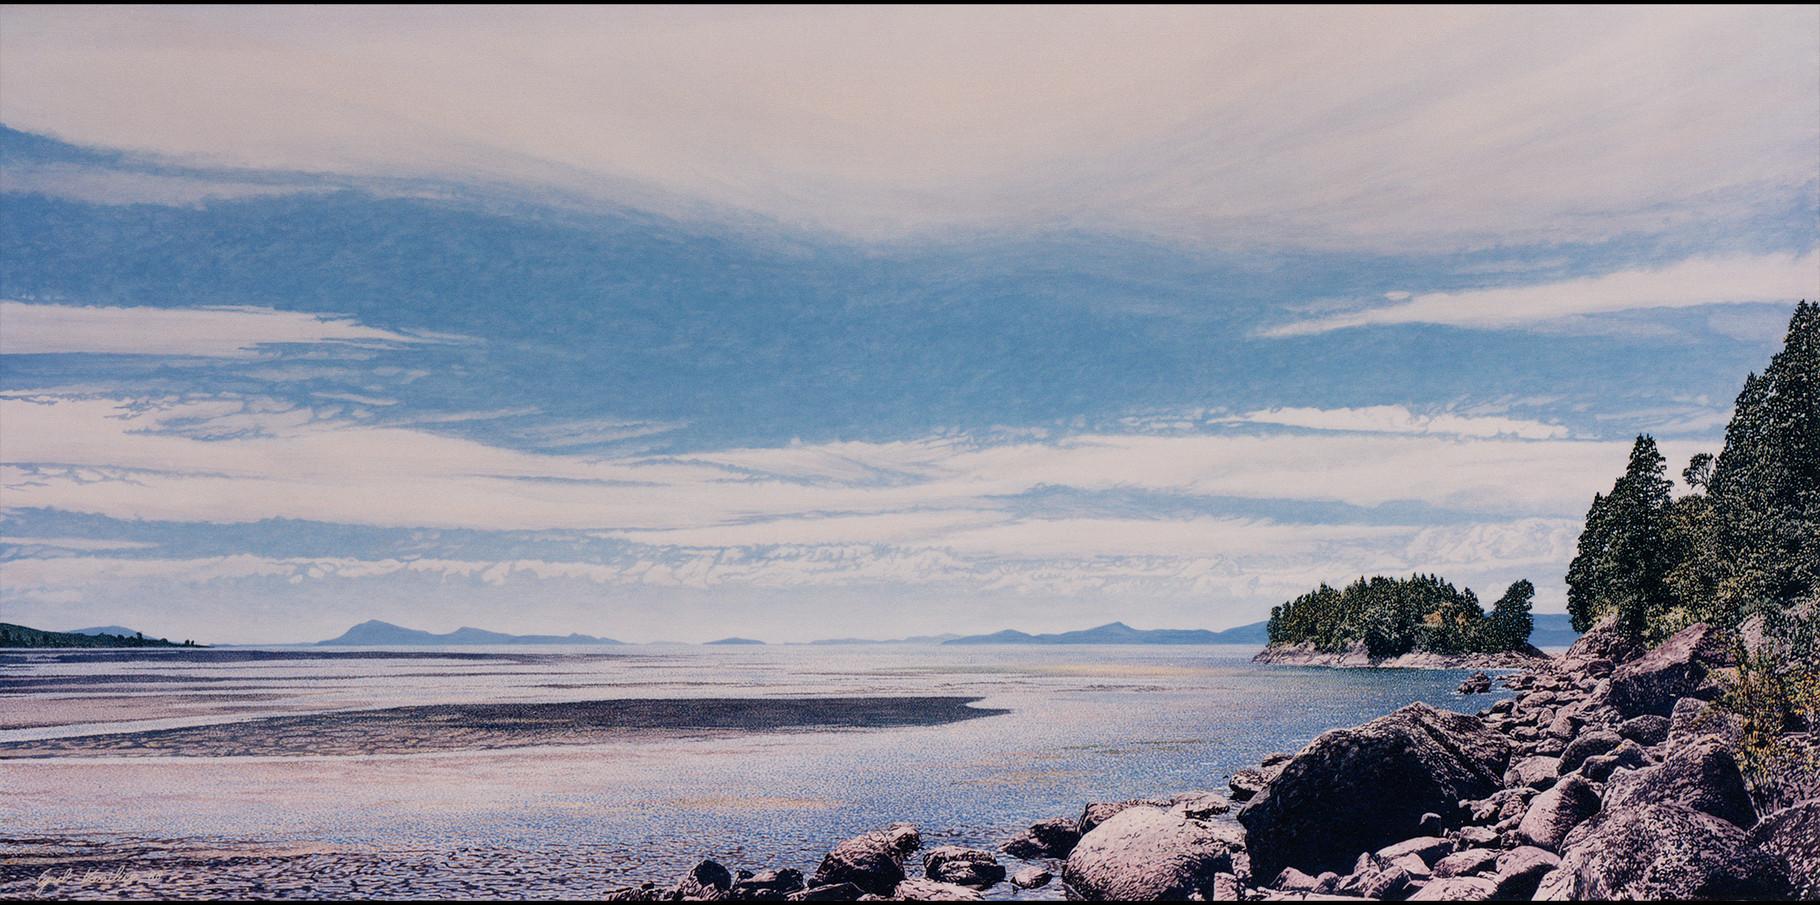 lago Ranco  Acrylique sur toile  195x97